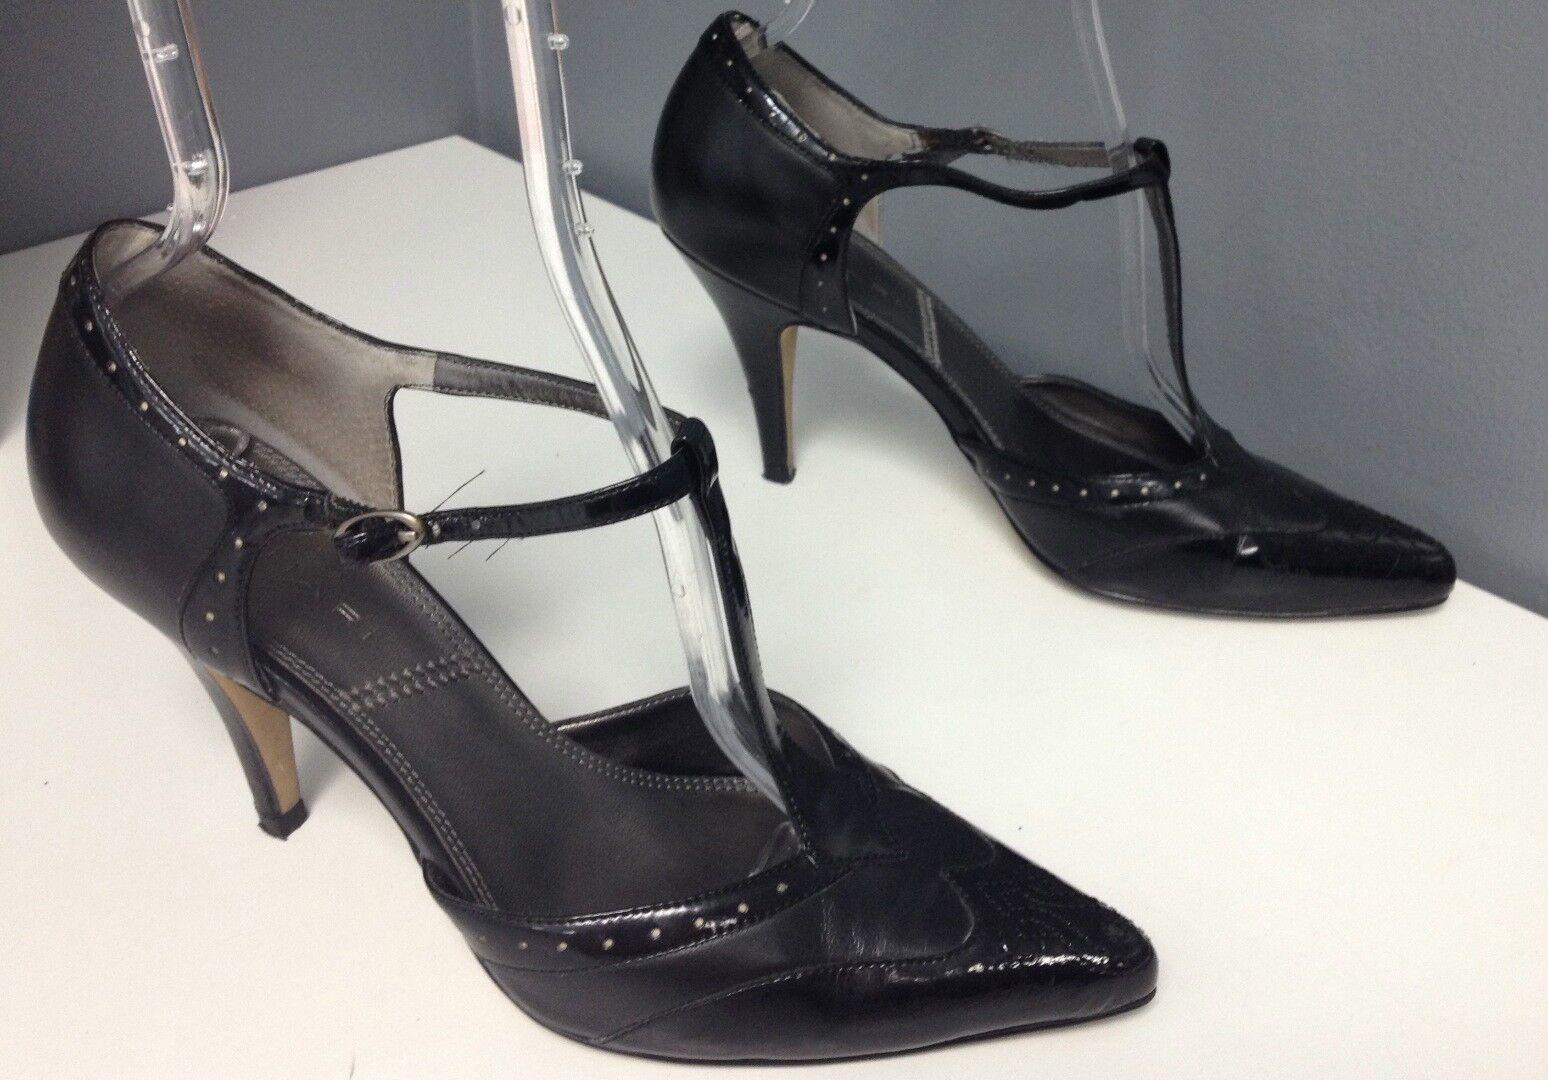 TAHARI Black Leather Pointy Toe T Strap Sz Embossed Top Buckle Heels Sz Strap 8.5 b4086 5f0364